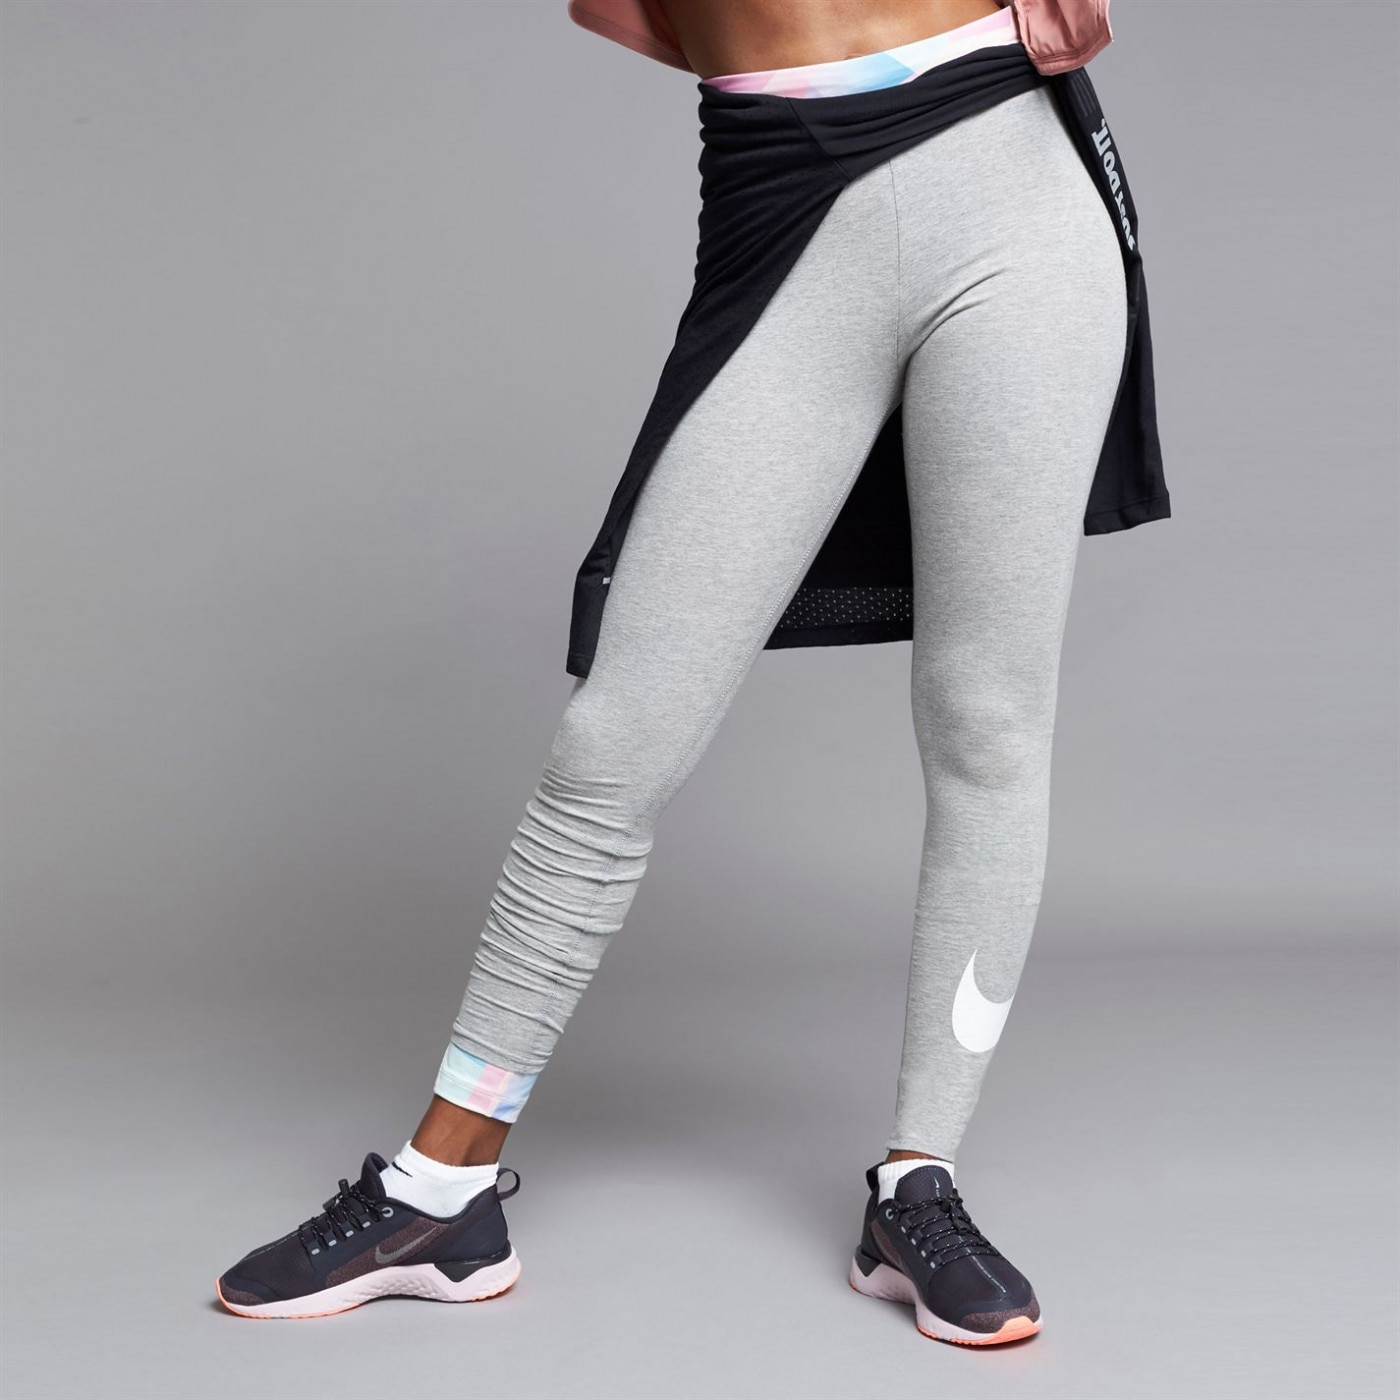 Women's leggins Nike Sportswear Club